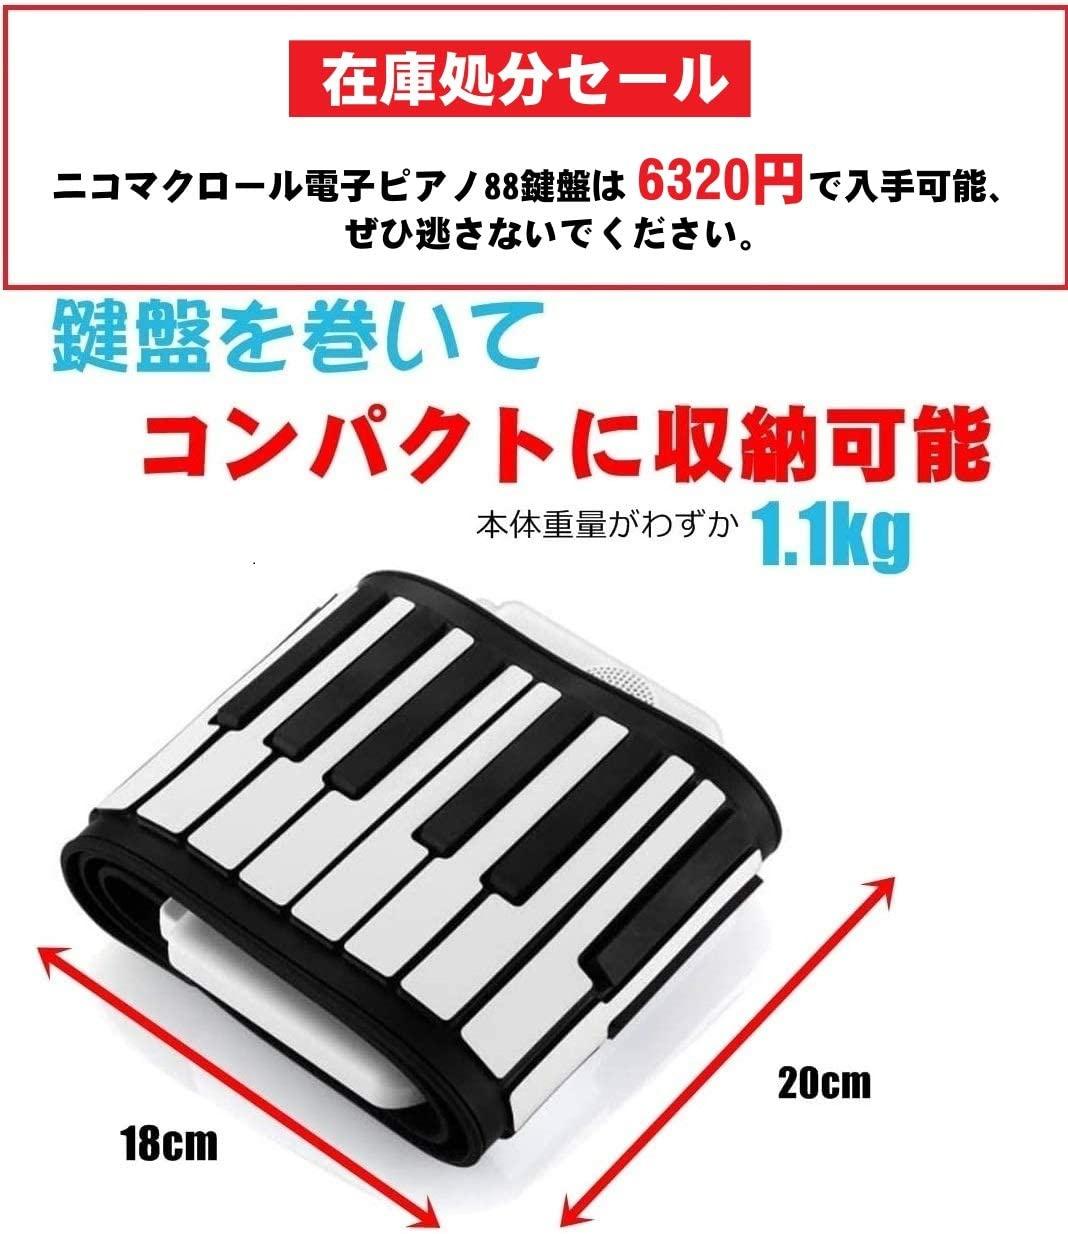 NikoMaku(ニコマク) ロールピアノ 88鍵盤の商品画像2